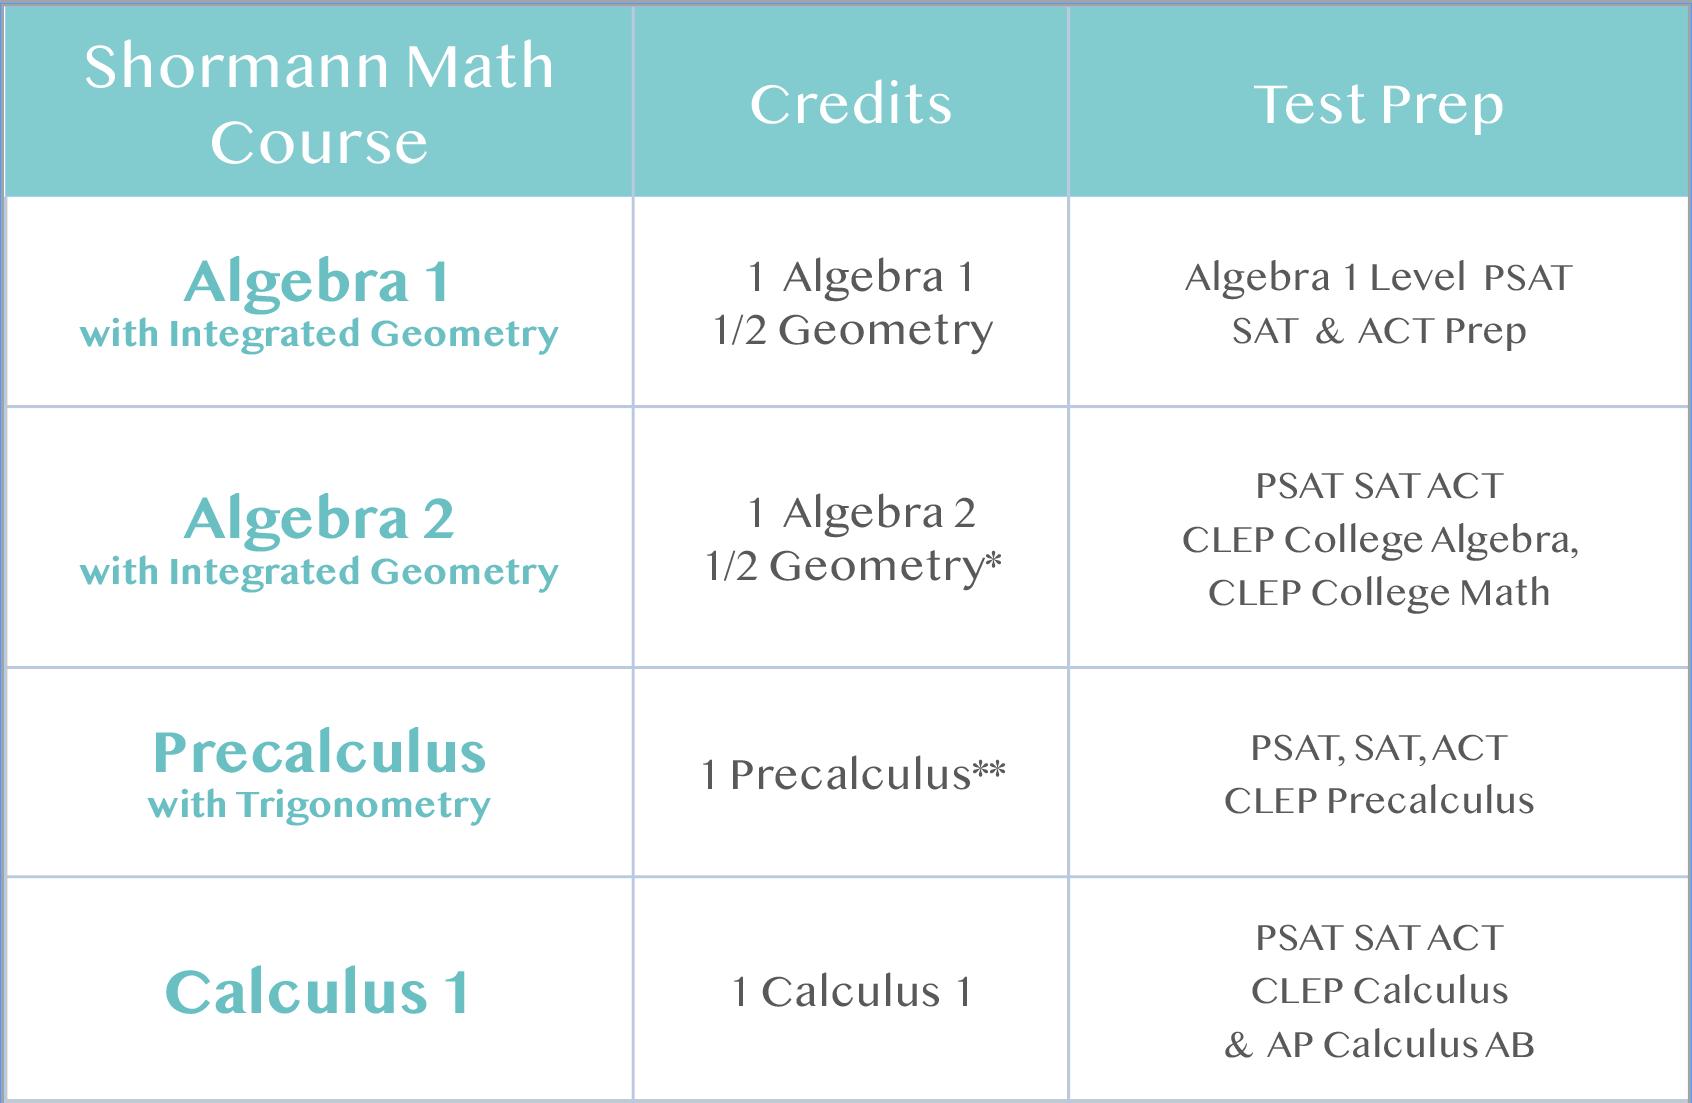 july-2020-cpurse-sequence-chart-shormann-math.png